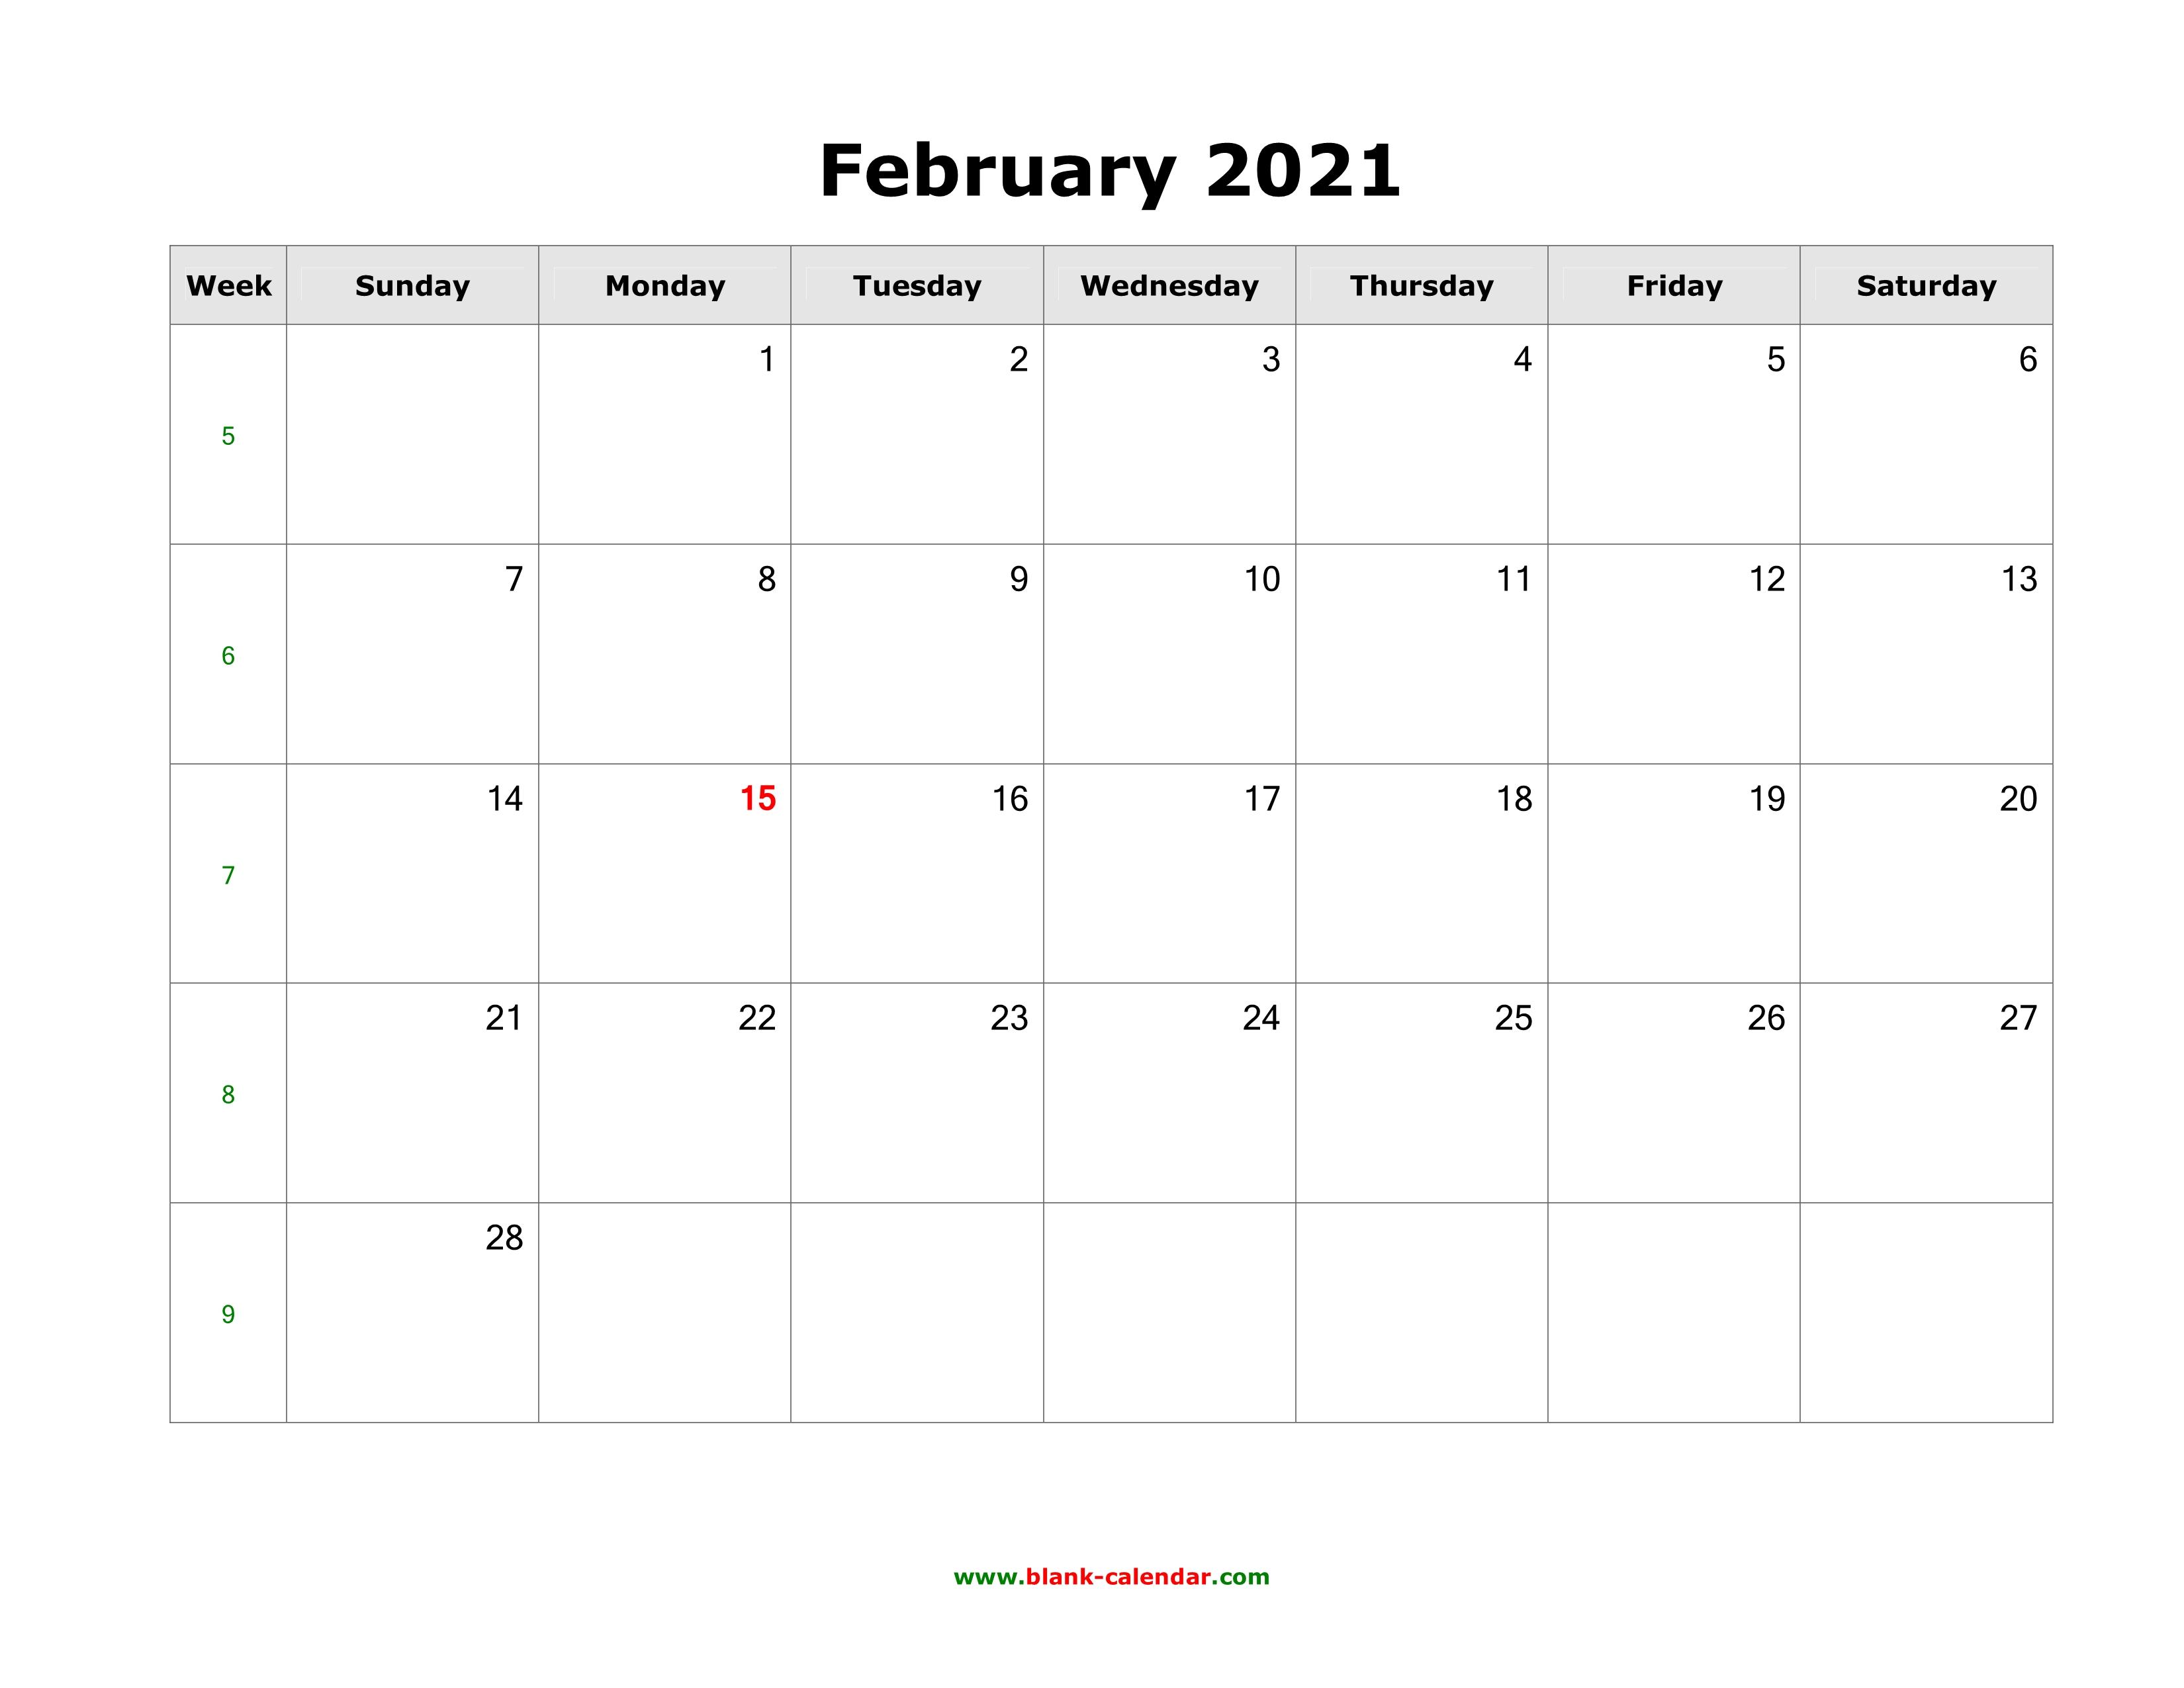 Download February 2021 Blank Calendar (horizontal)